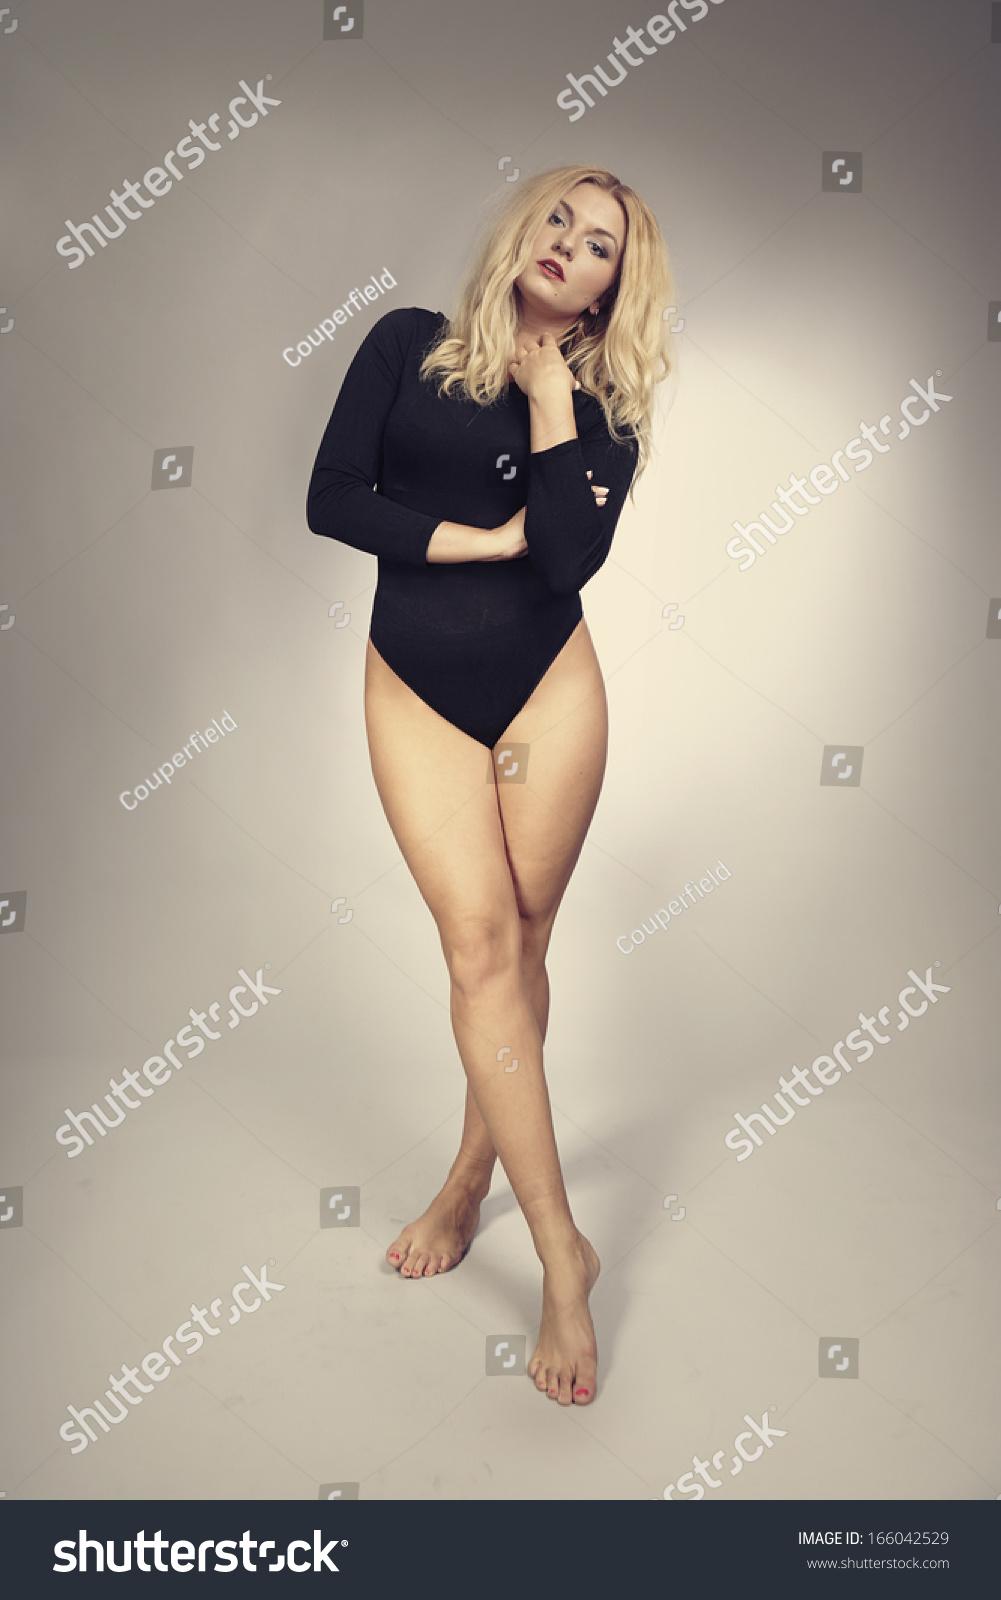 busty blonde beauty posing studio stock photo & image (royalty-free